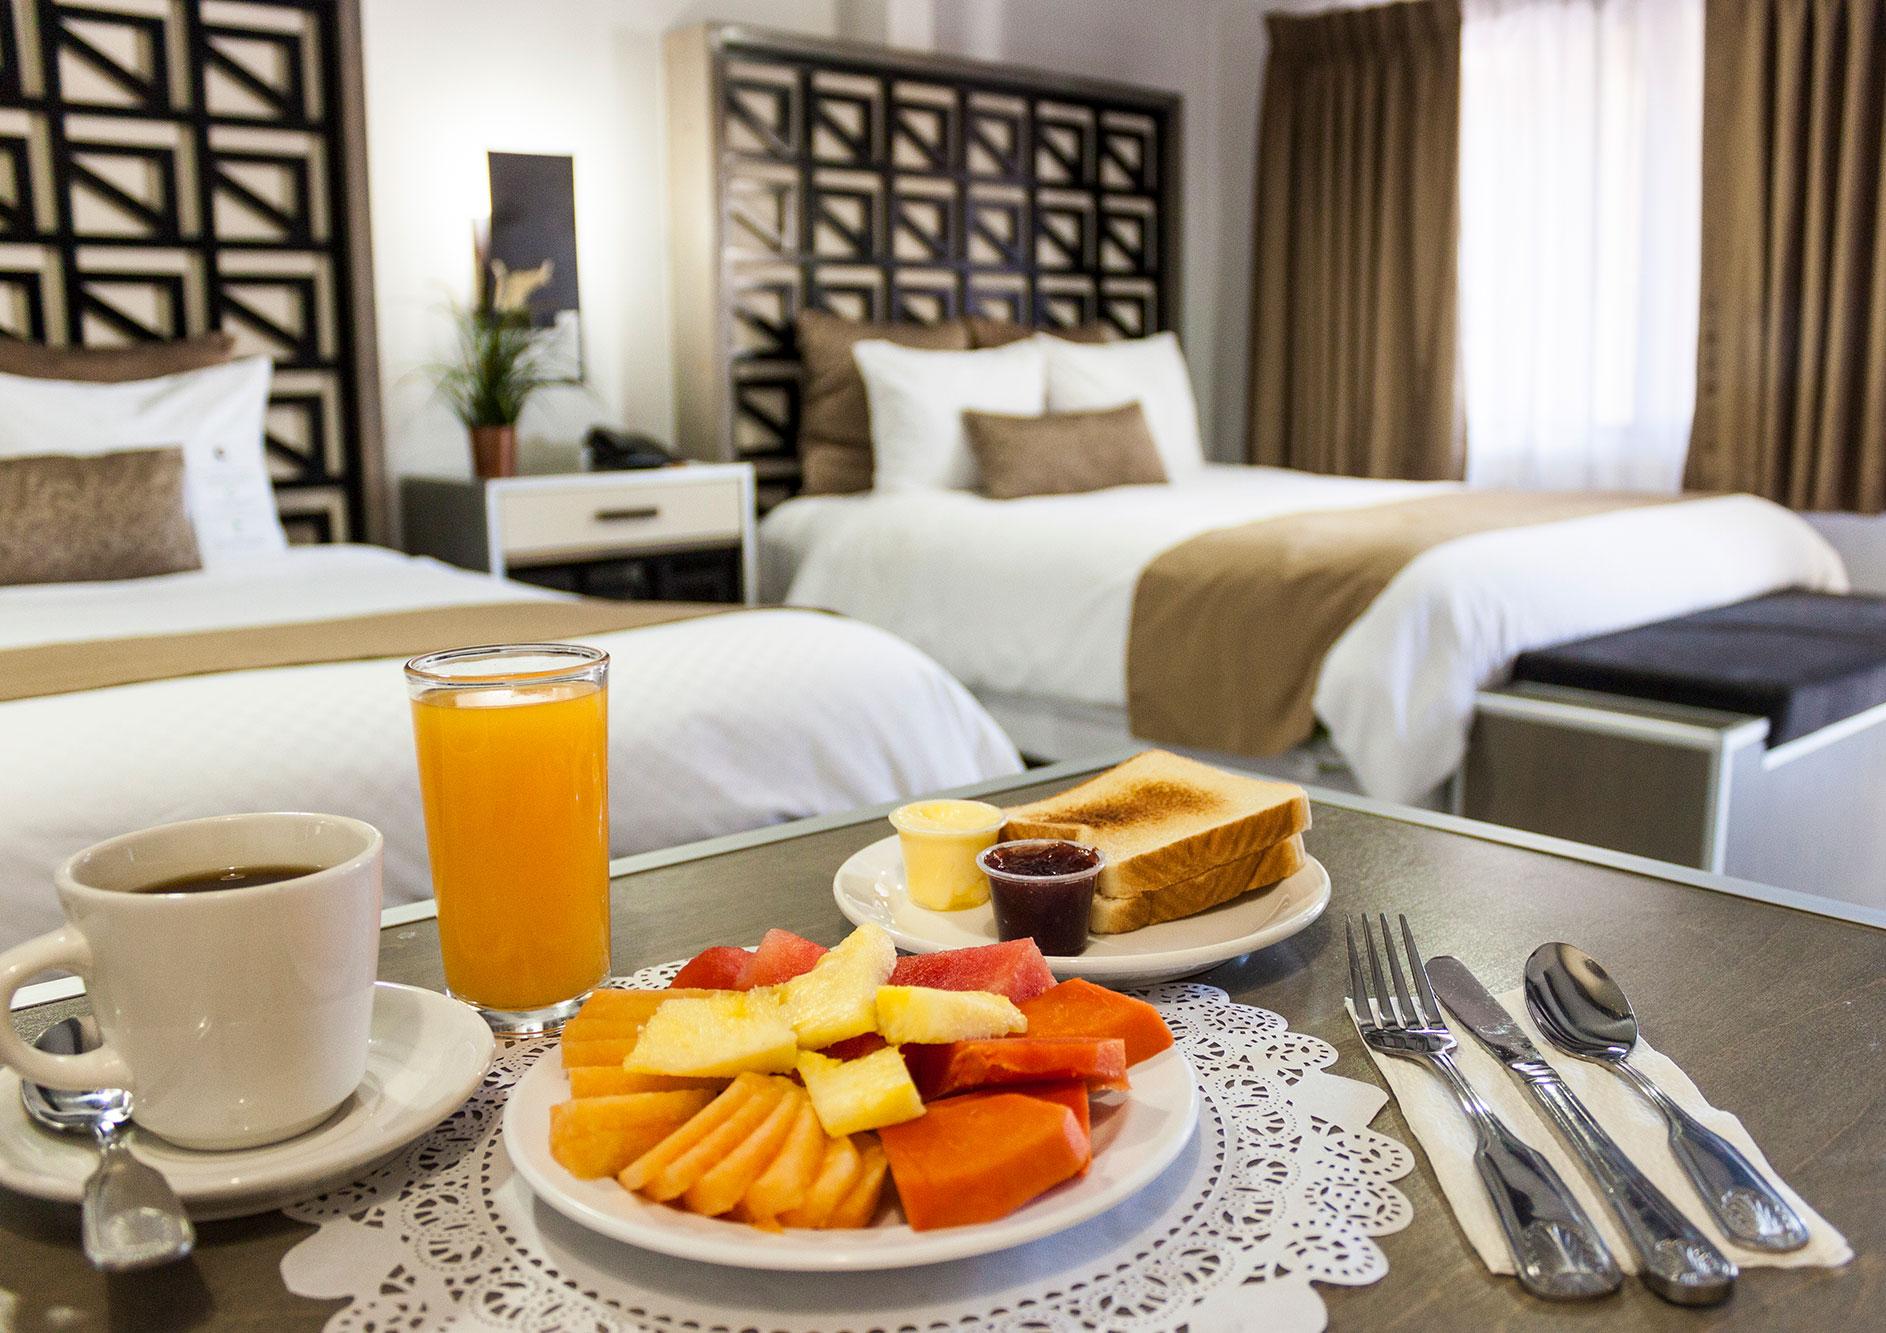 desayuno continental hotel hacienda del rio tijuana